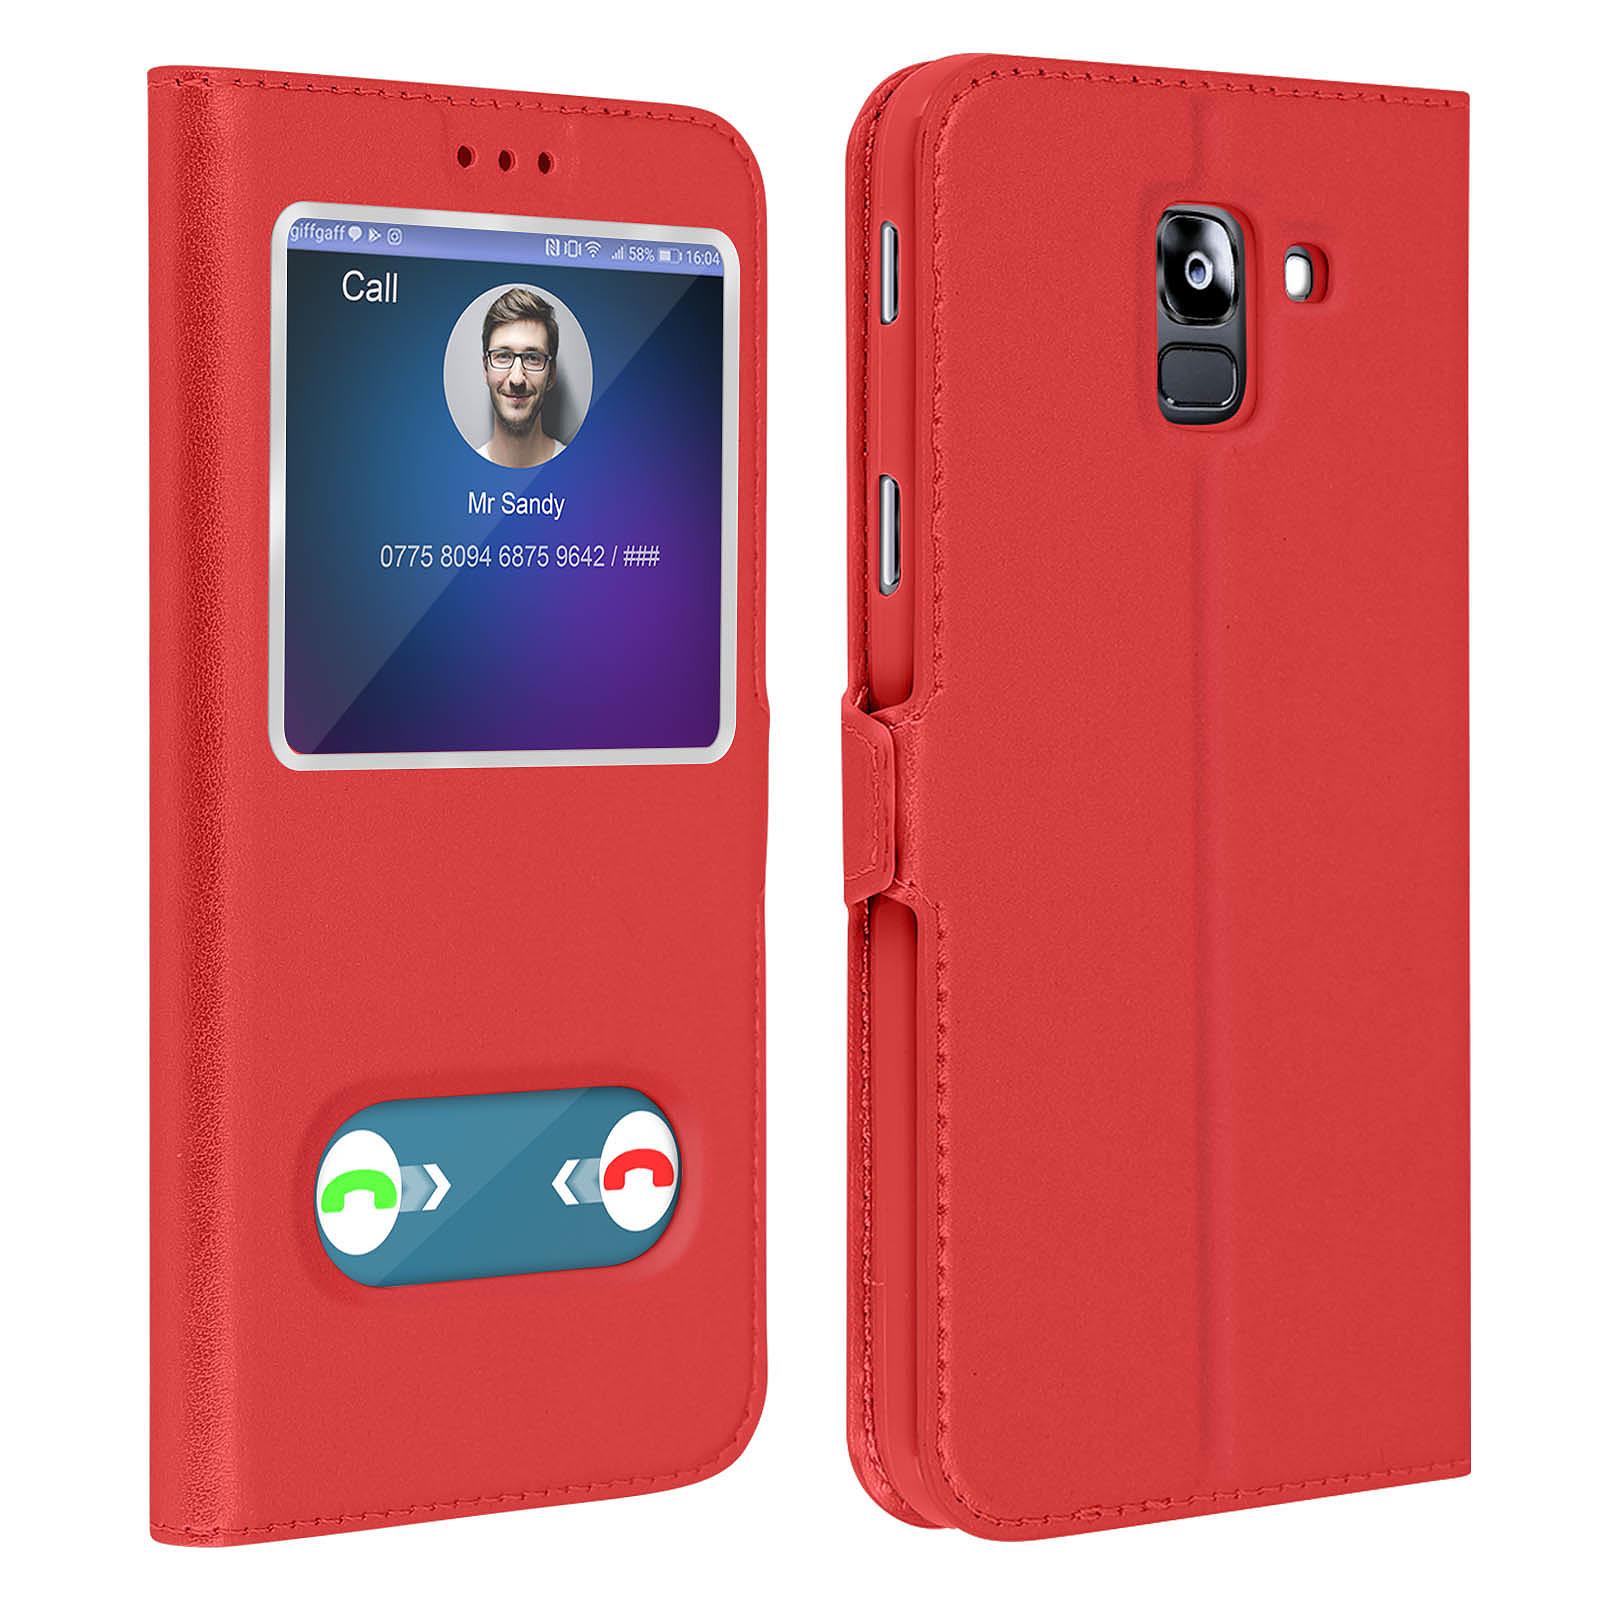 Avizar Etui folio Rouge Support Vidéo pour Samsung Galaxy J6